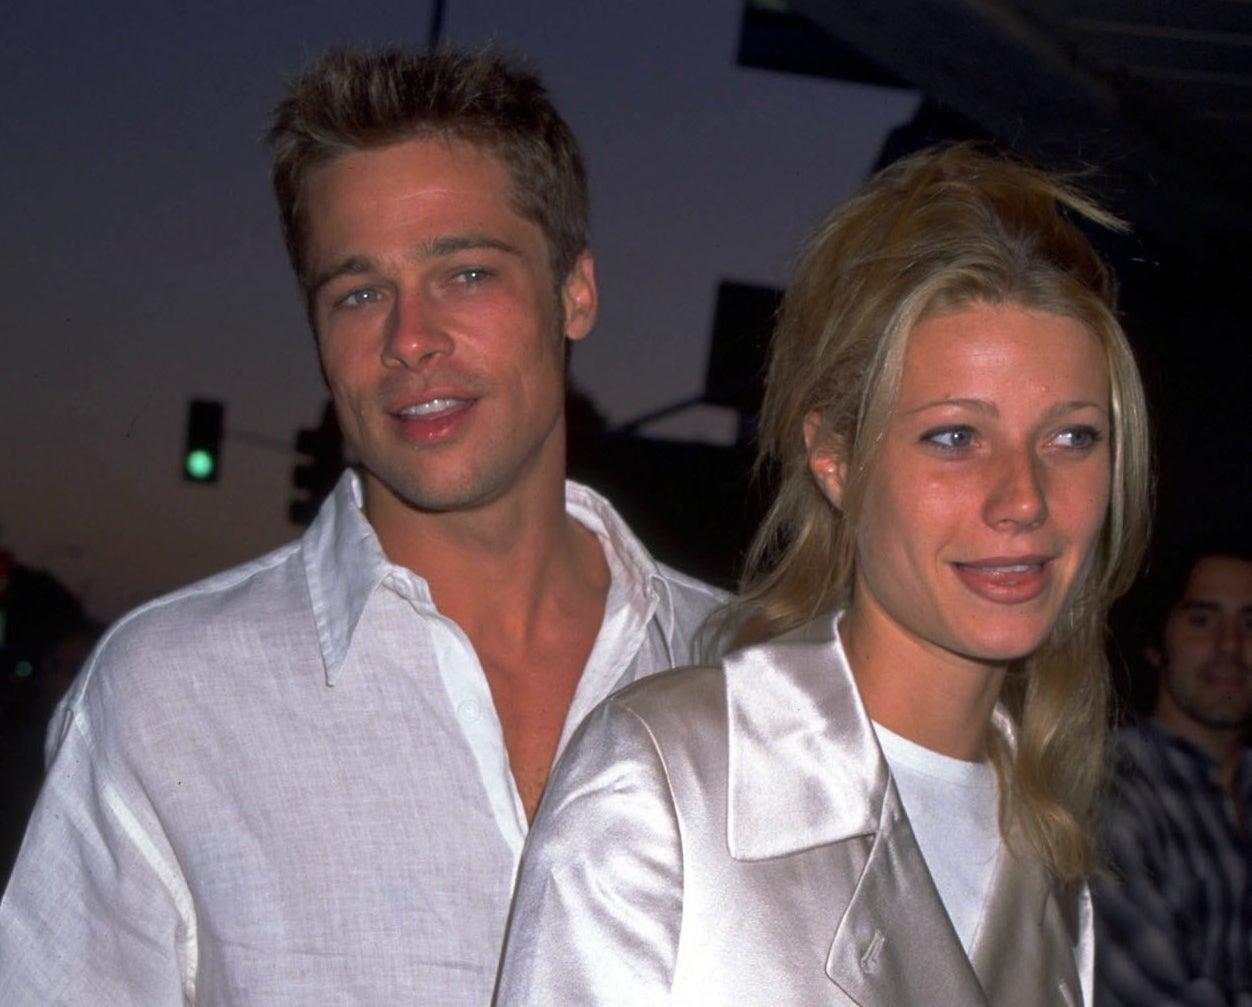 Gwyneth and Brad wear similar white button-down tops